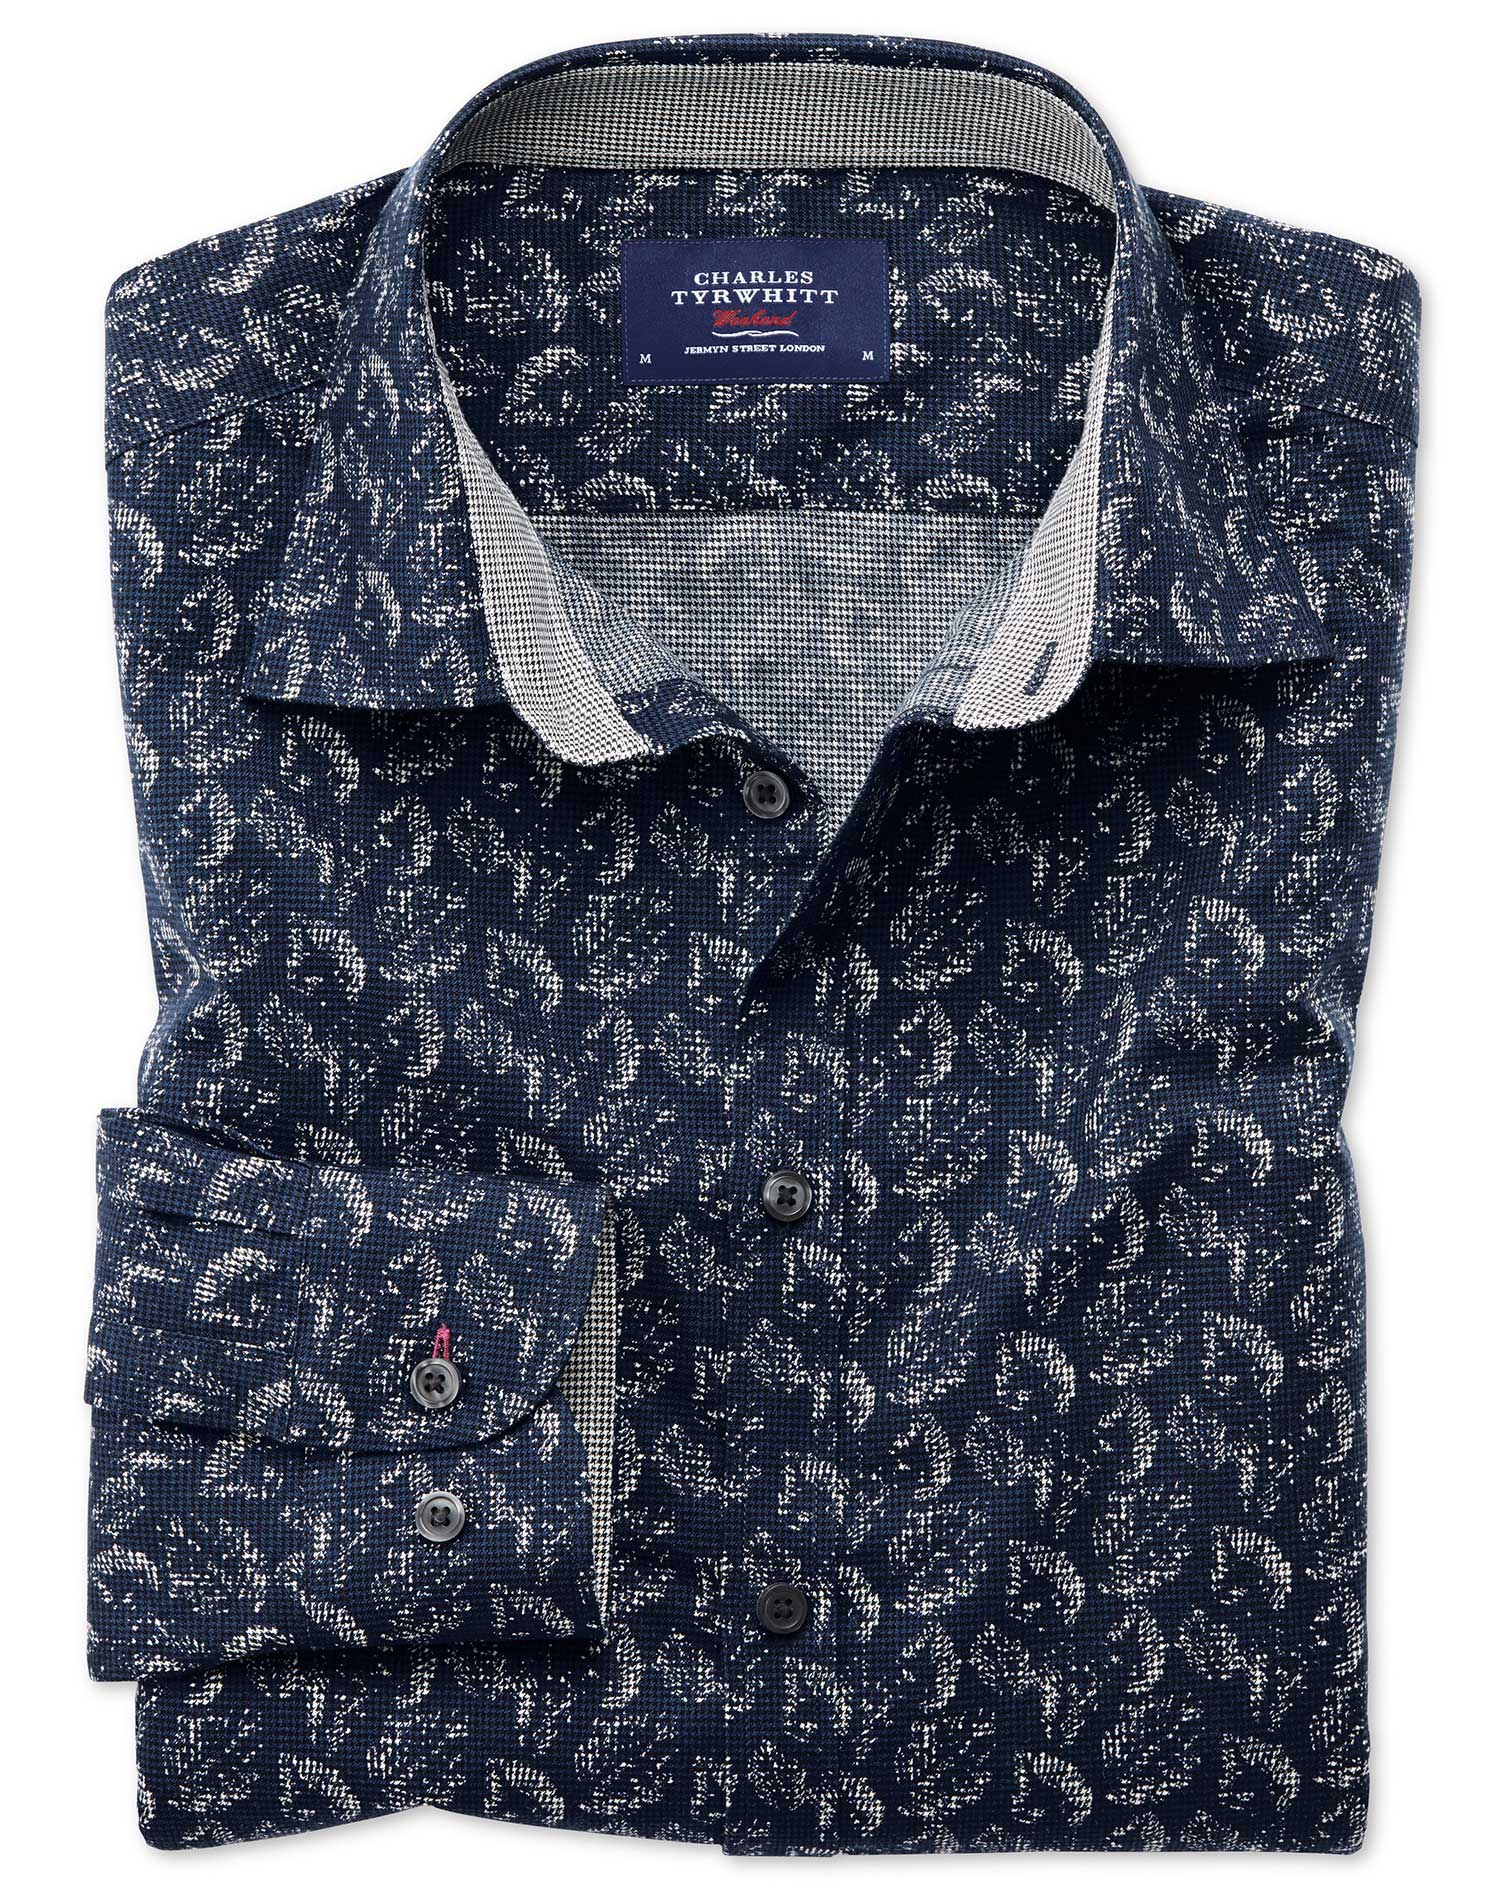 Classic Fit Dark Blue Leaf Print Cotton Shirt Single Cuff Size Medium by Charles Tyrwhitt